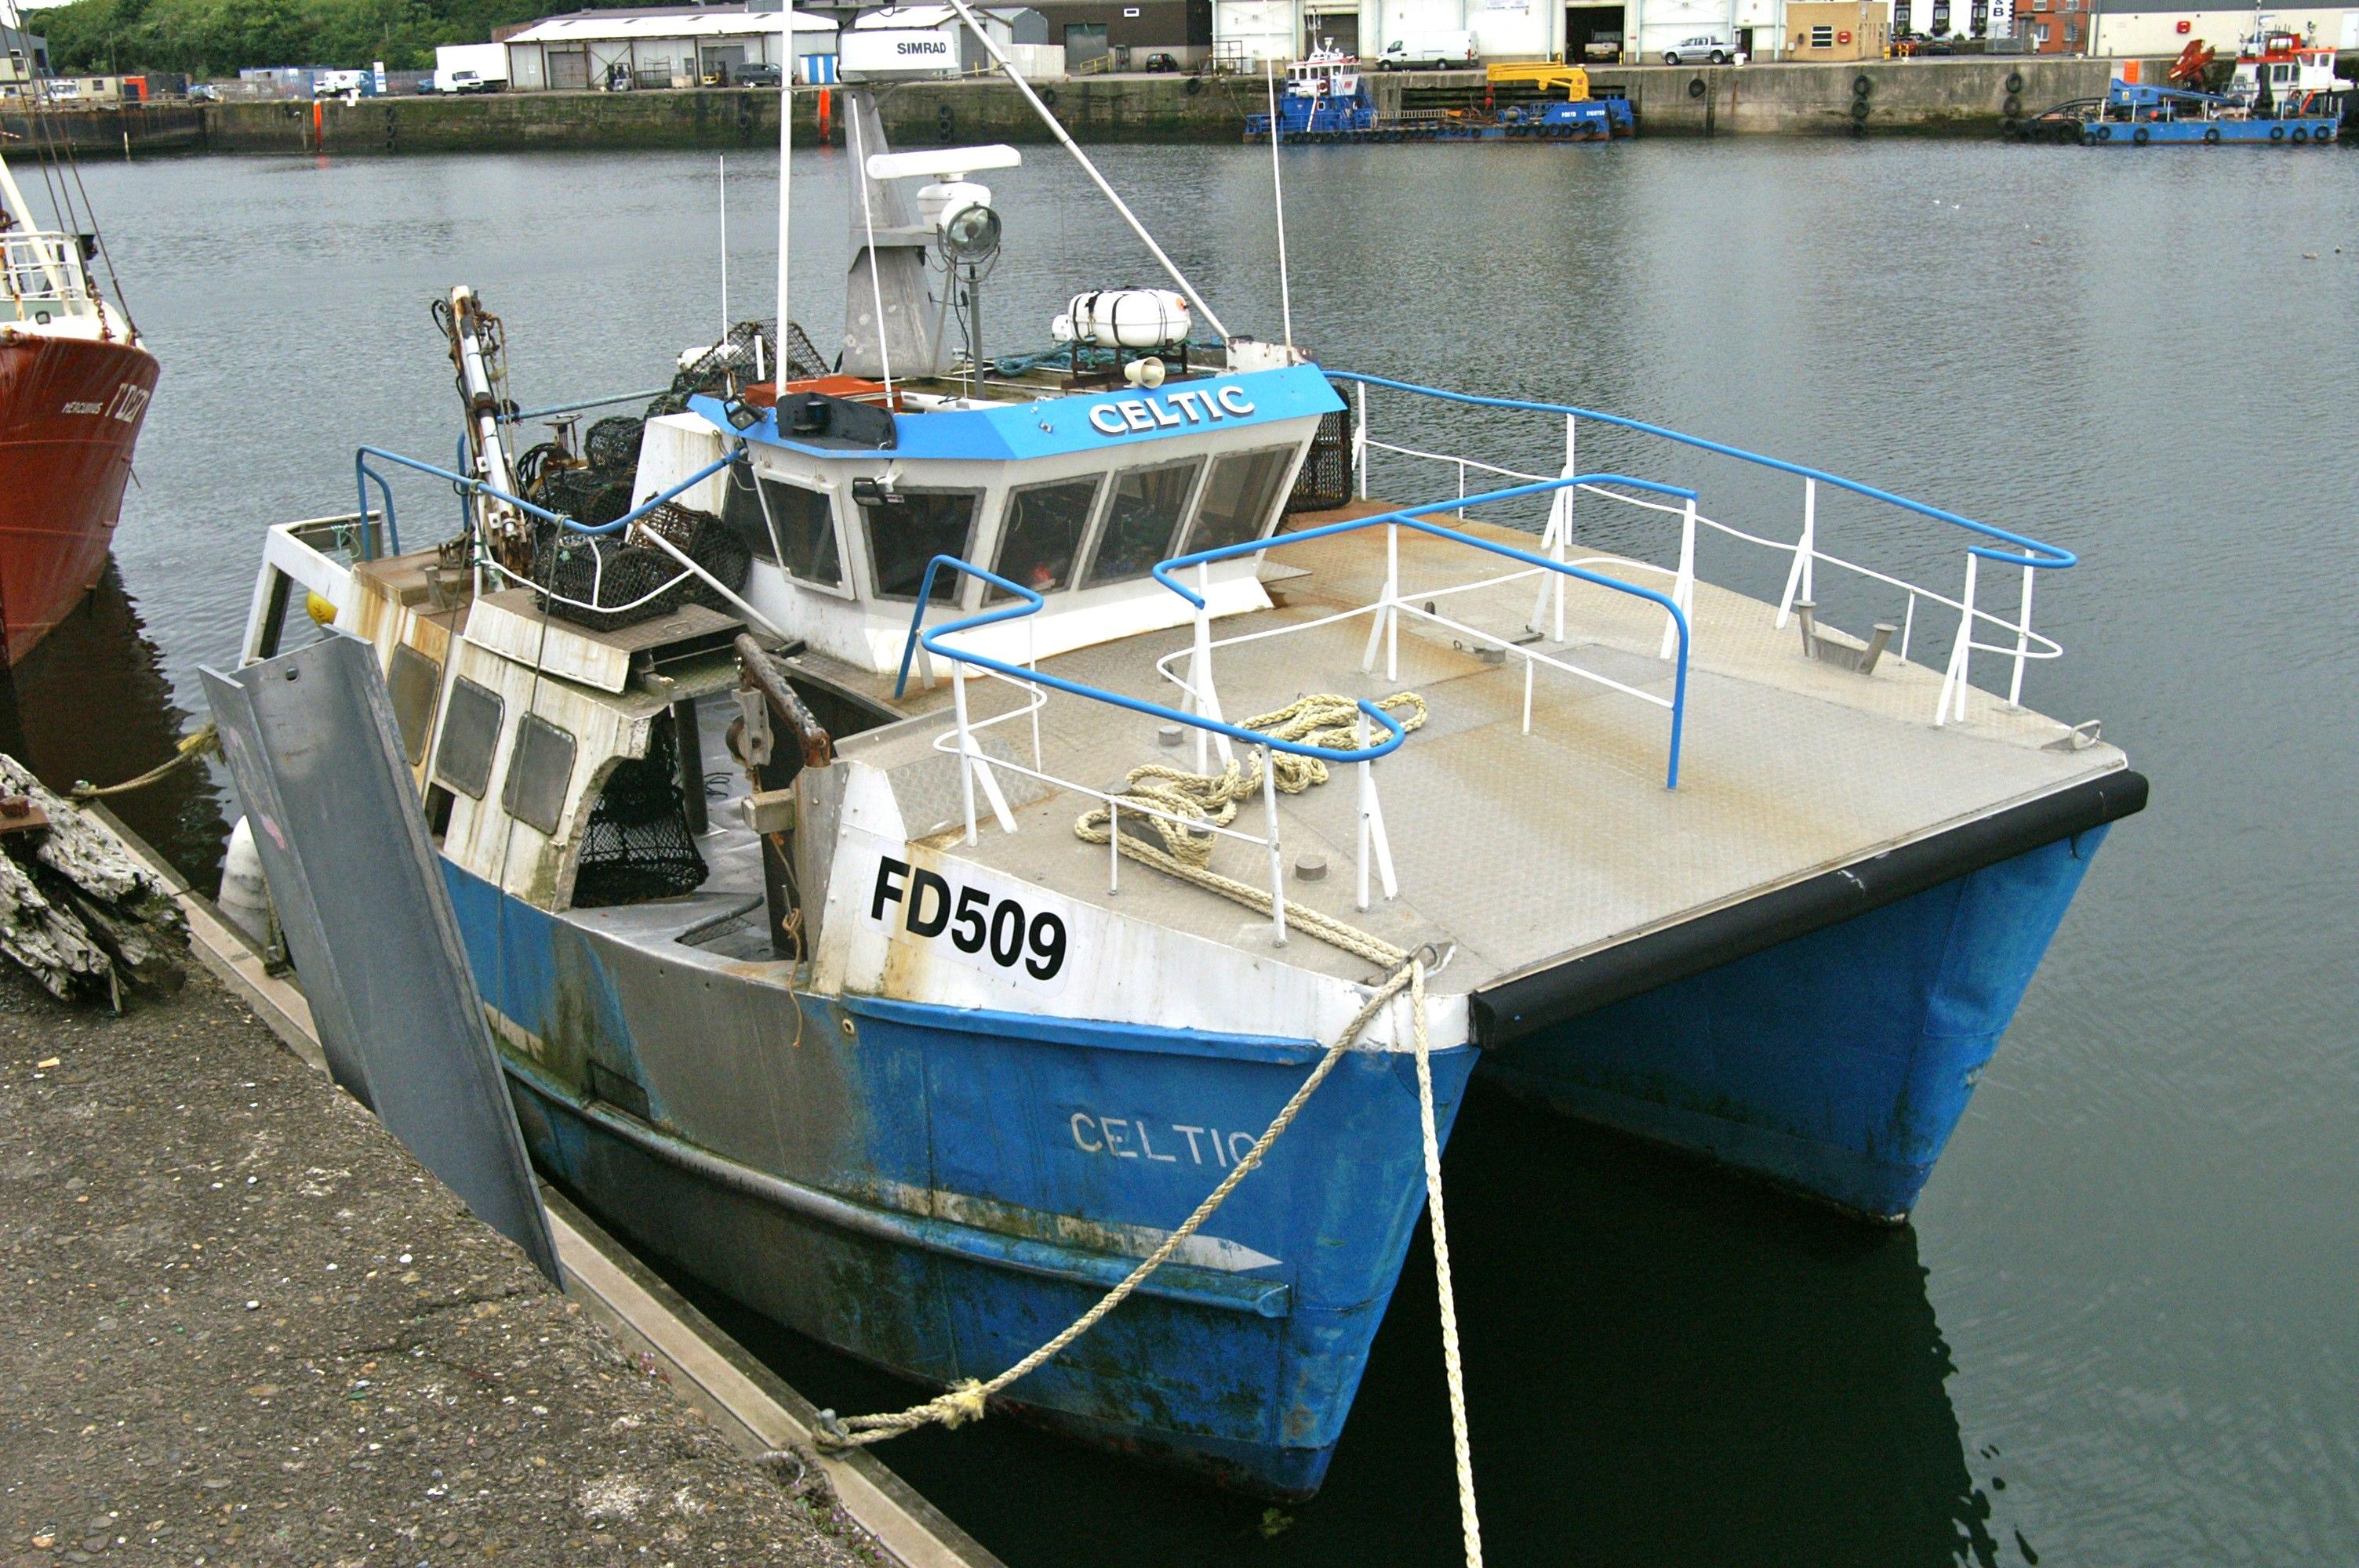 File:Lobster Fishing Boat - Celtic.jpg - Wikimedia Commons